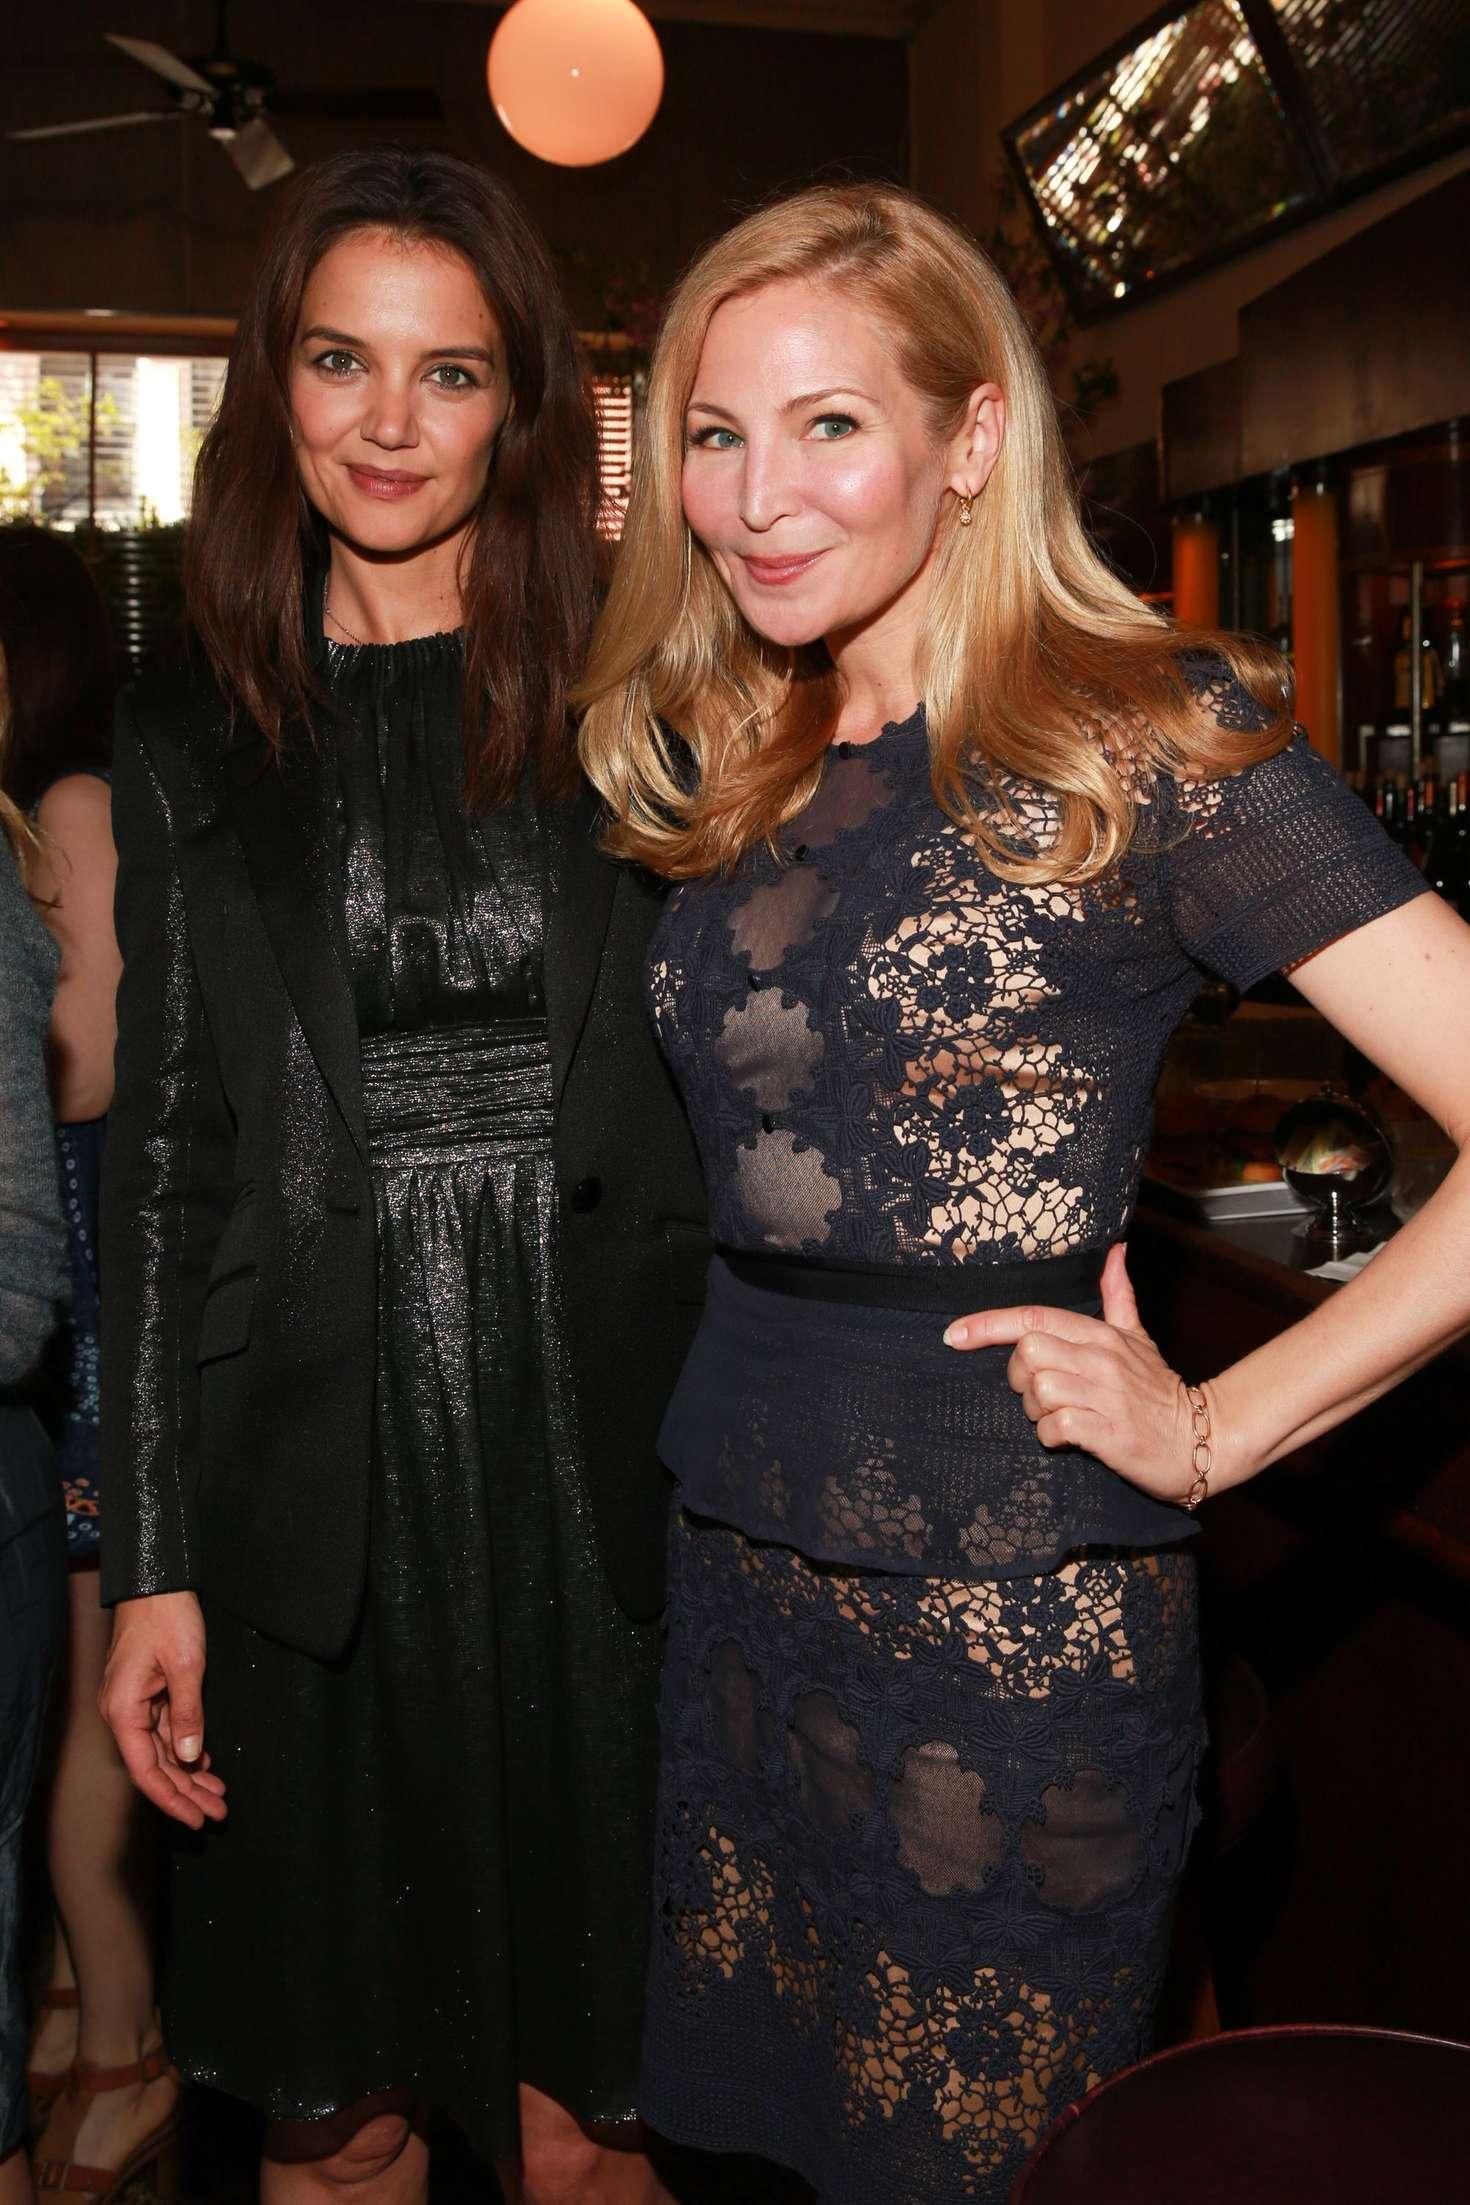 Katie Holmes 2016 : Katie Holmes: Women Filmmakers Luncheon at Tribeca Film Festival 2016 -10